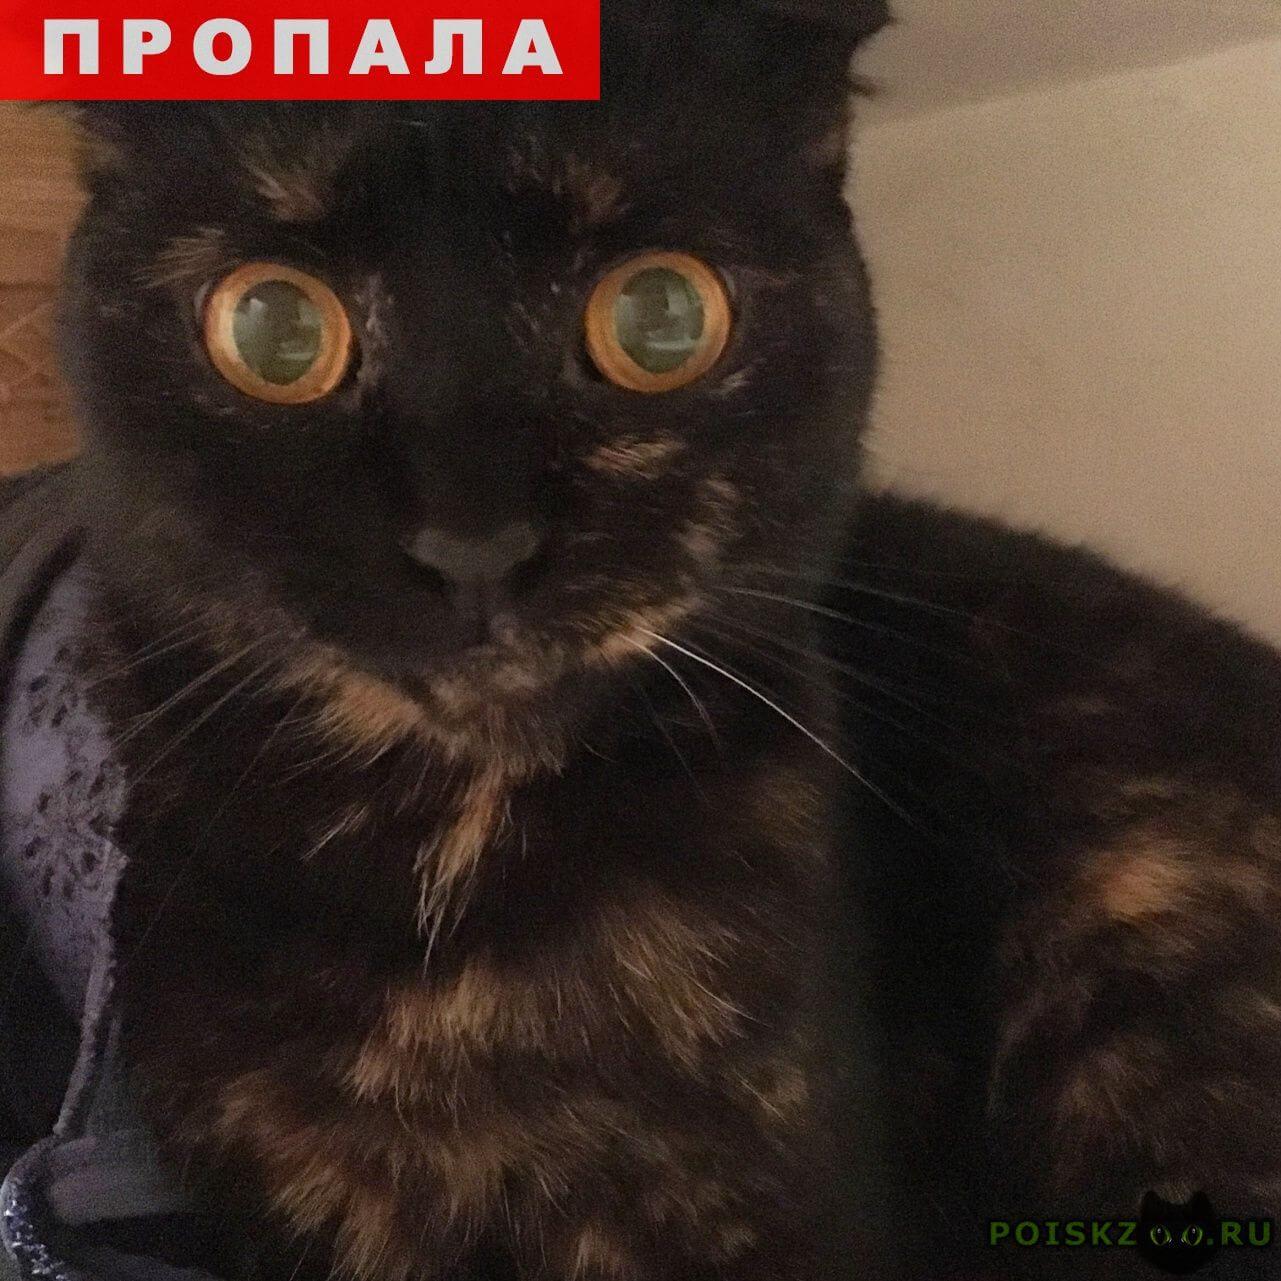 Пропала кошка вислоухая г.Краснодар